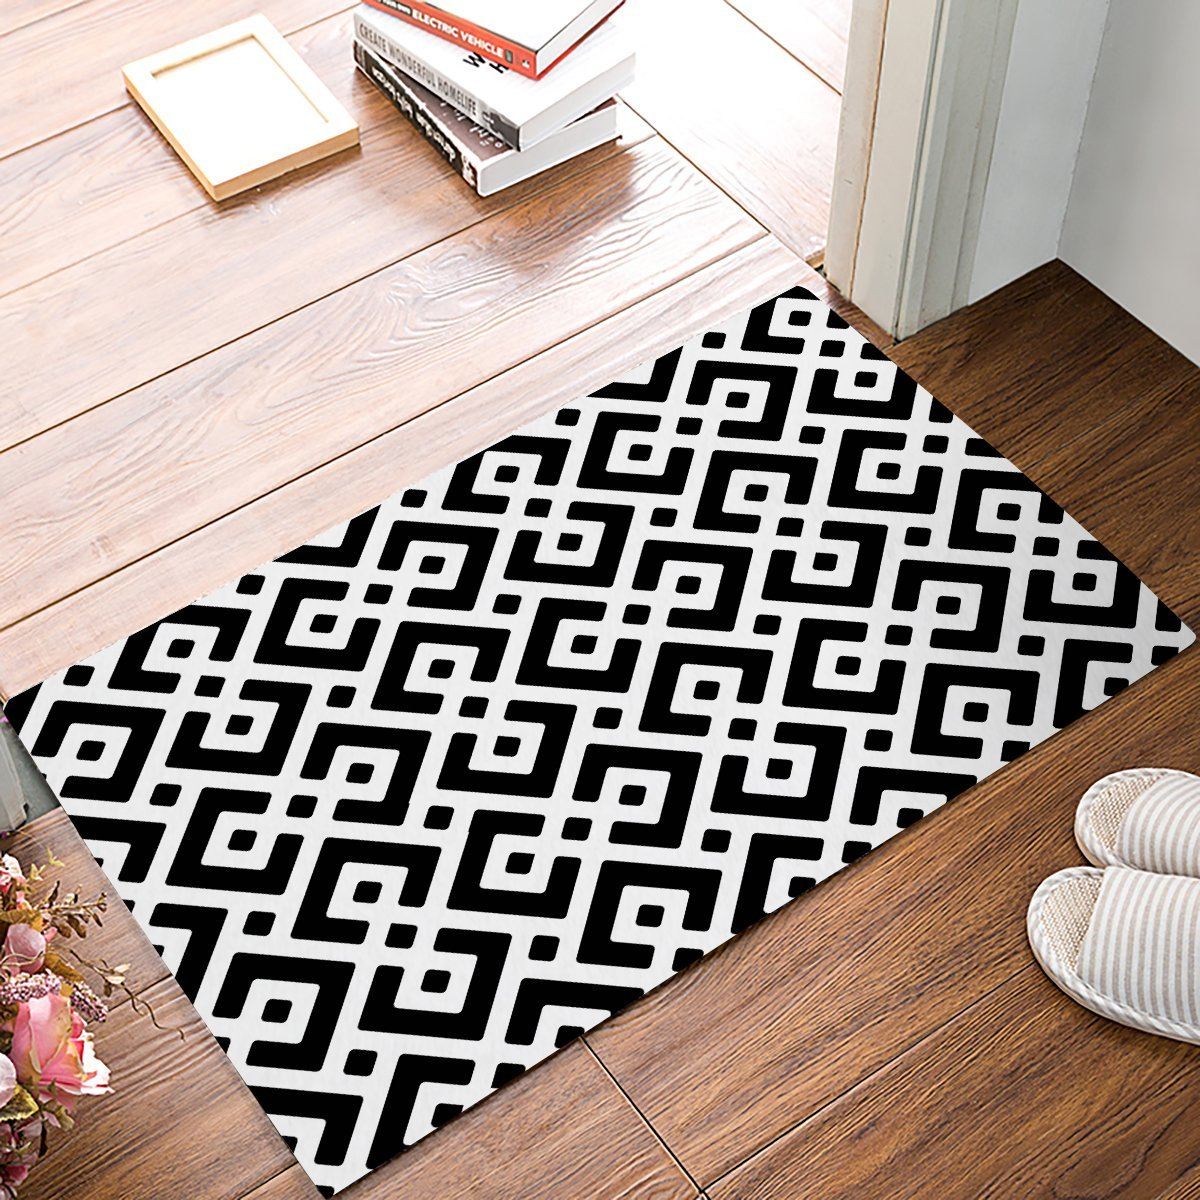 Black And White Geometric Kitchen Rug: Black And White Simple Geometric Pattern Door Mats Kitchen